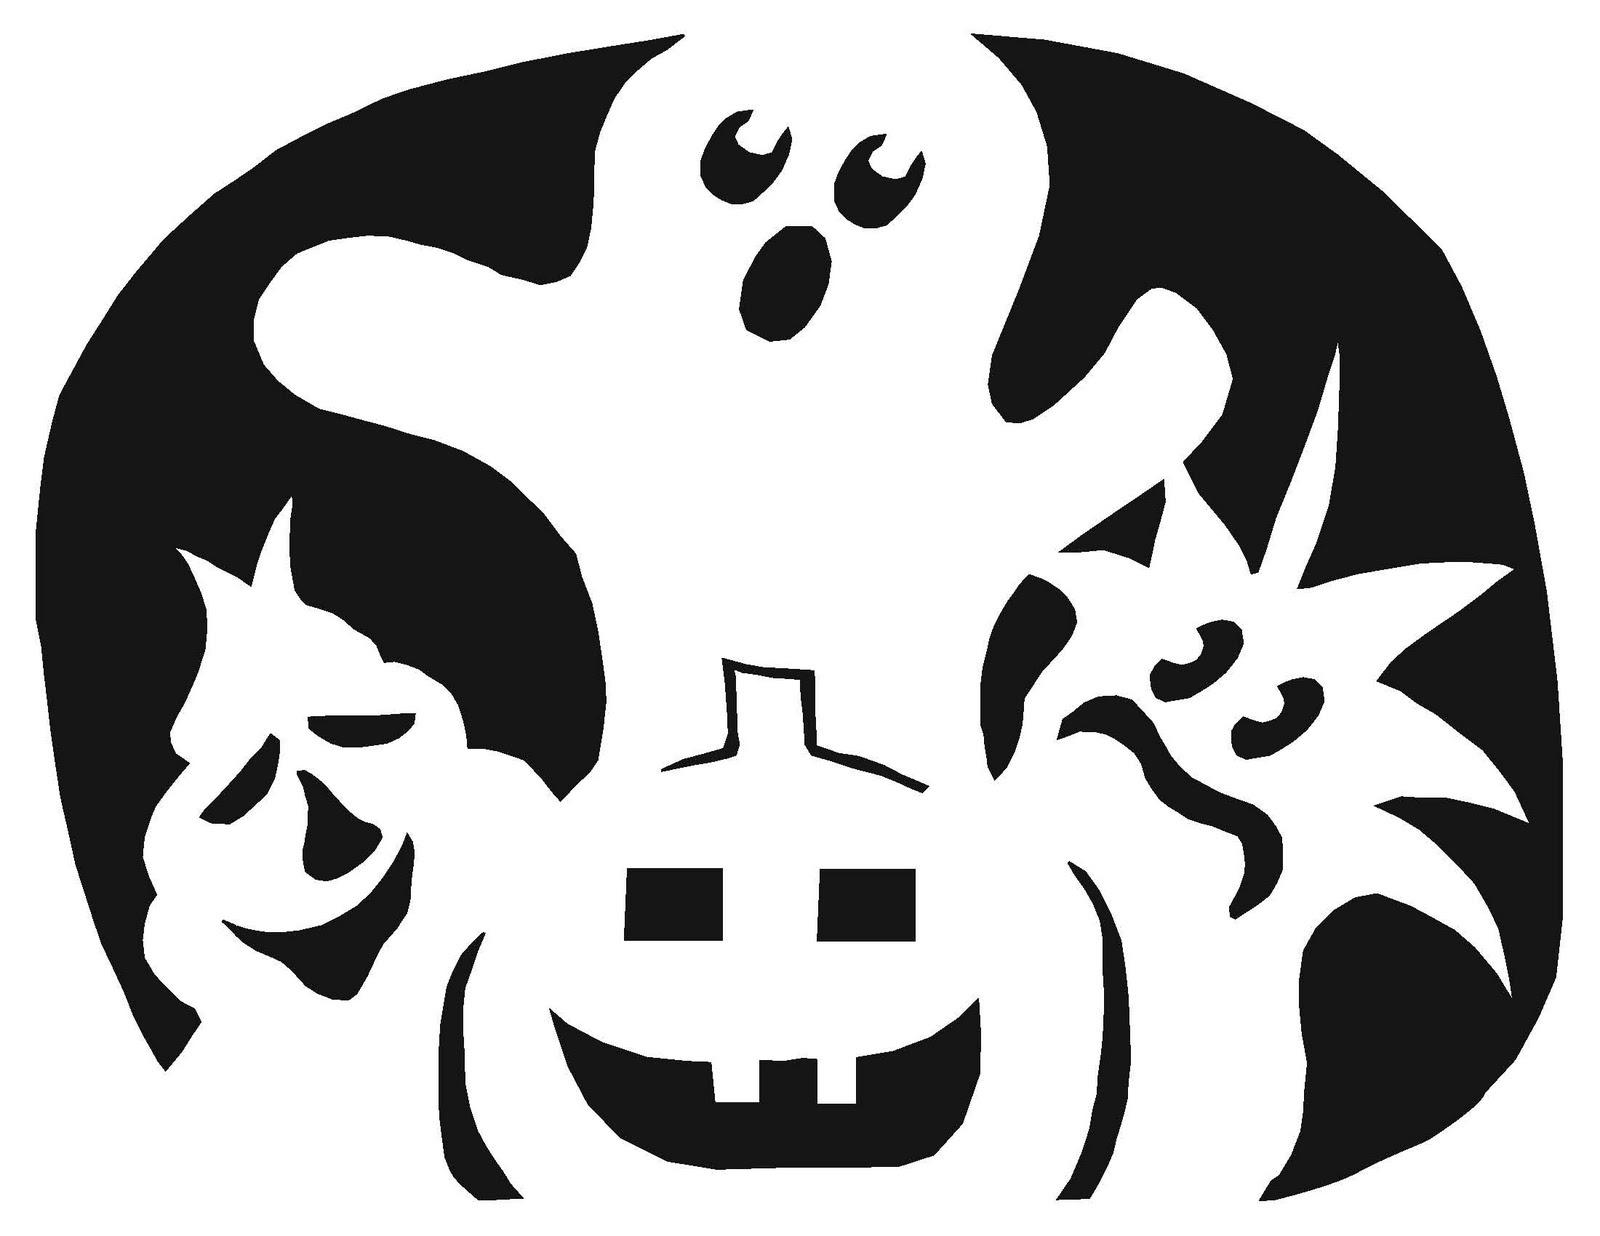 Free Guitar Pumpkin Stencil, Download Free Clip Art, Free Clip Art - Pumpkin Cutouts Printable Free